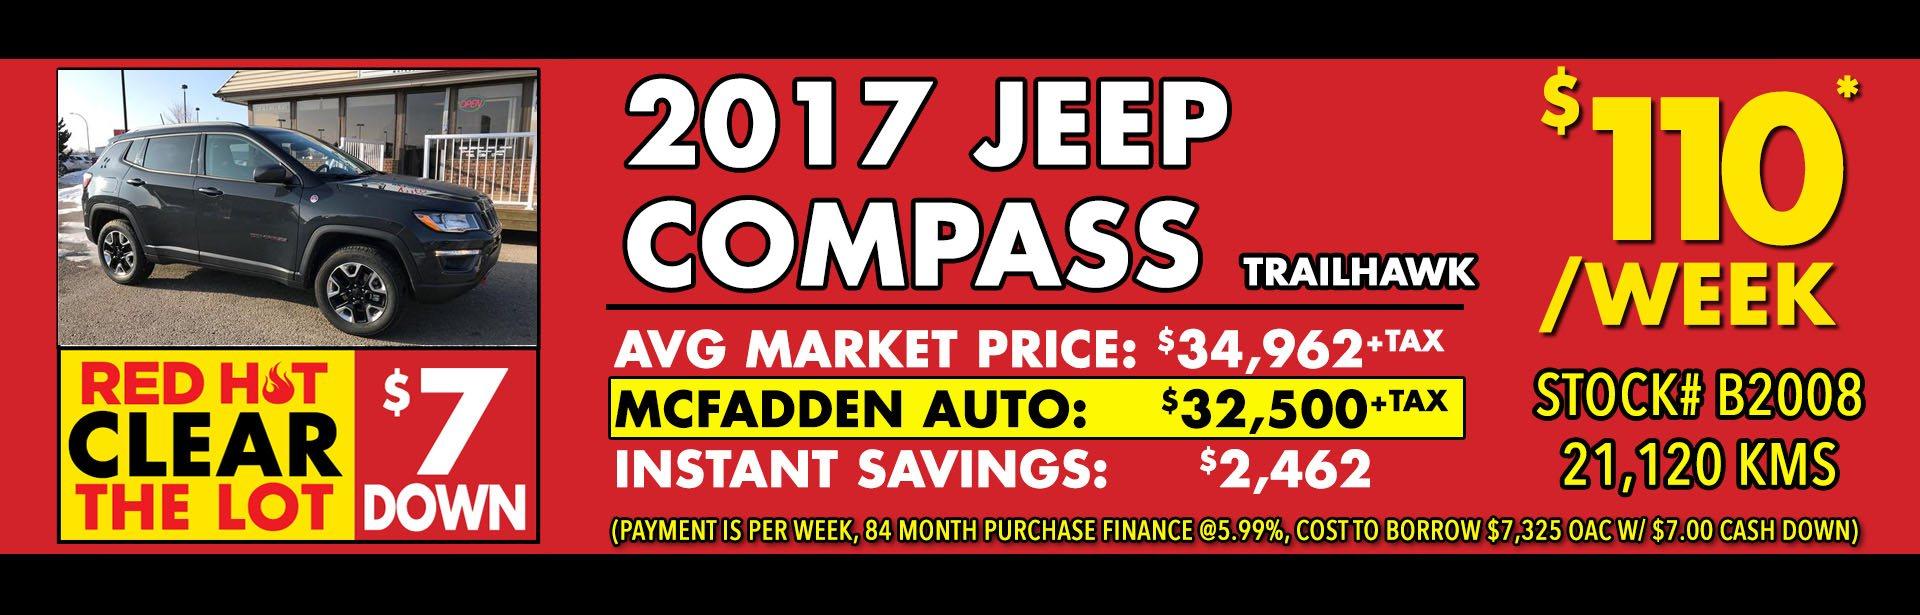 Red Hot - B2008 - 2017 Jeep Compass trailhawk - Feb 2018 - 1